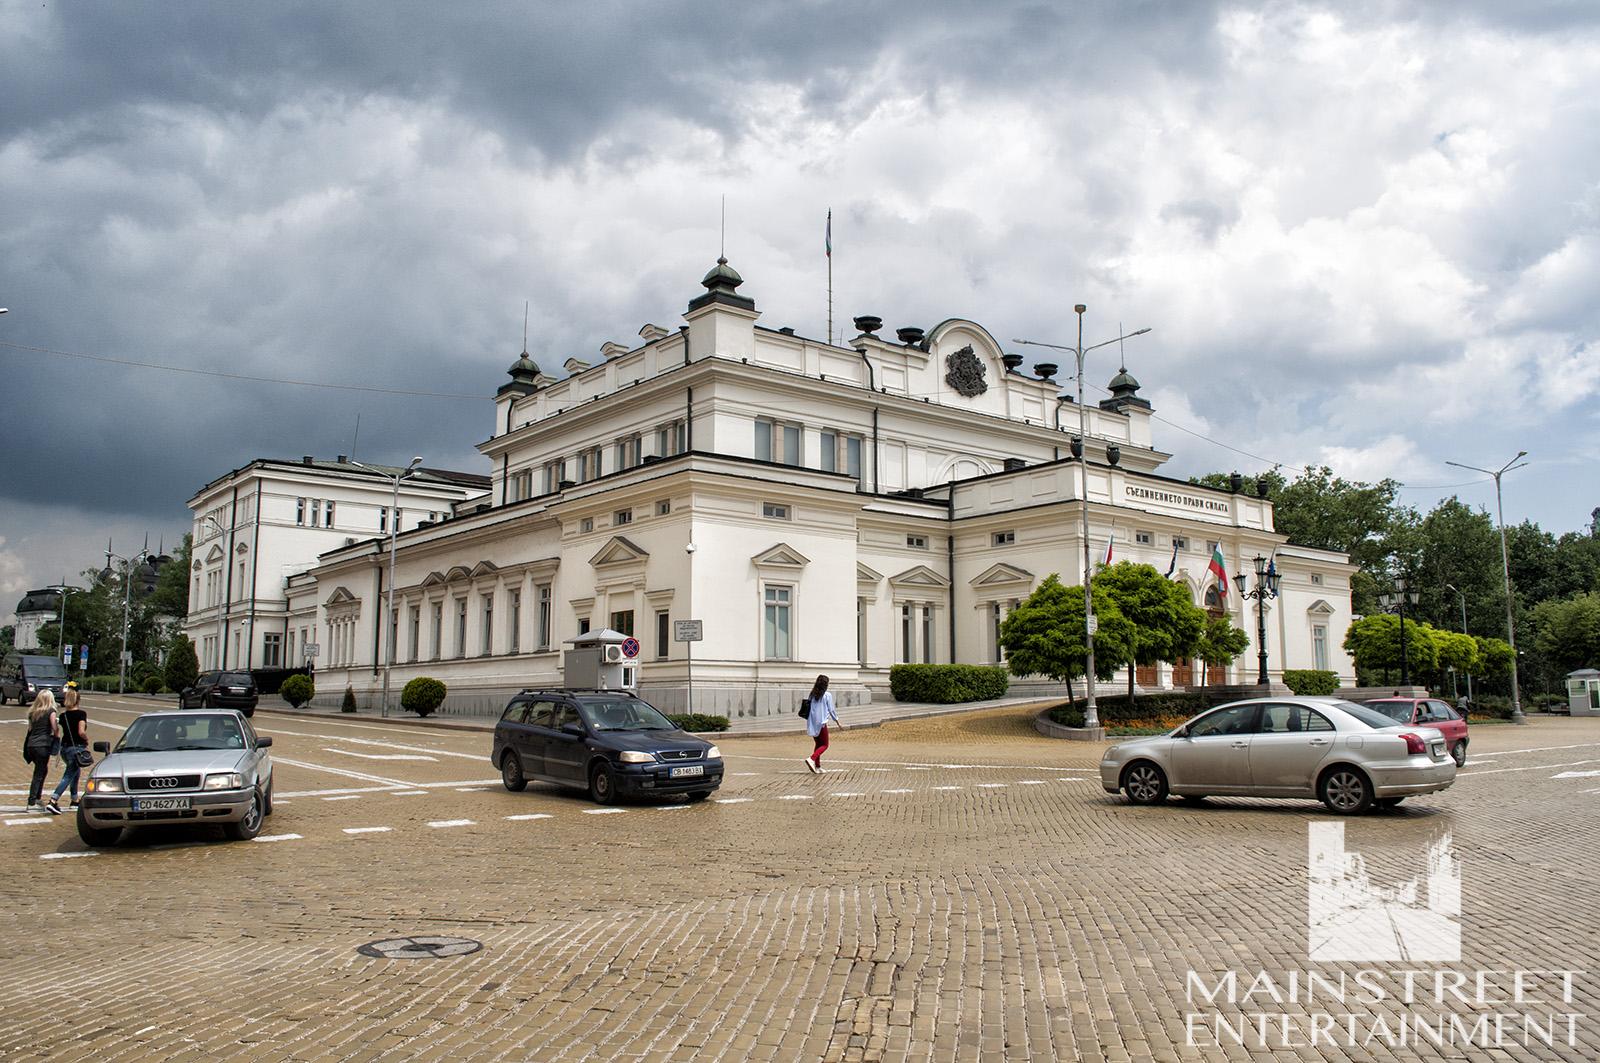 house of representatives period film location